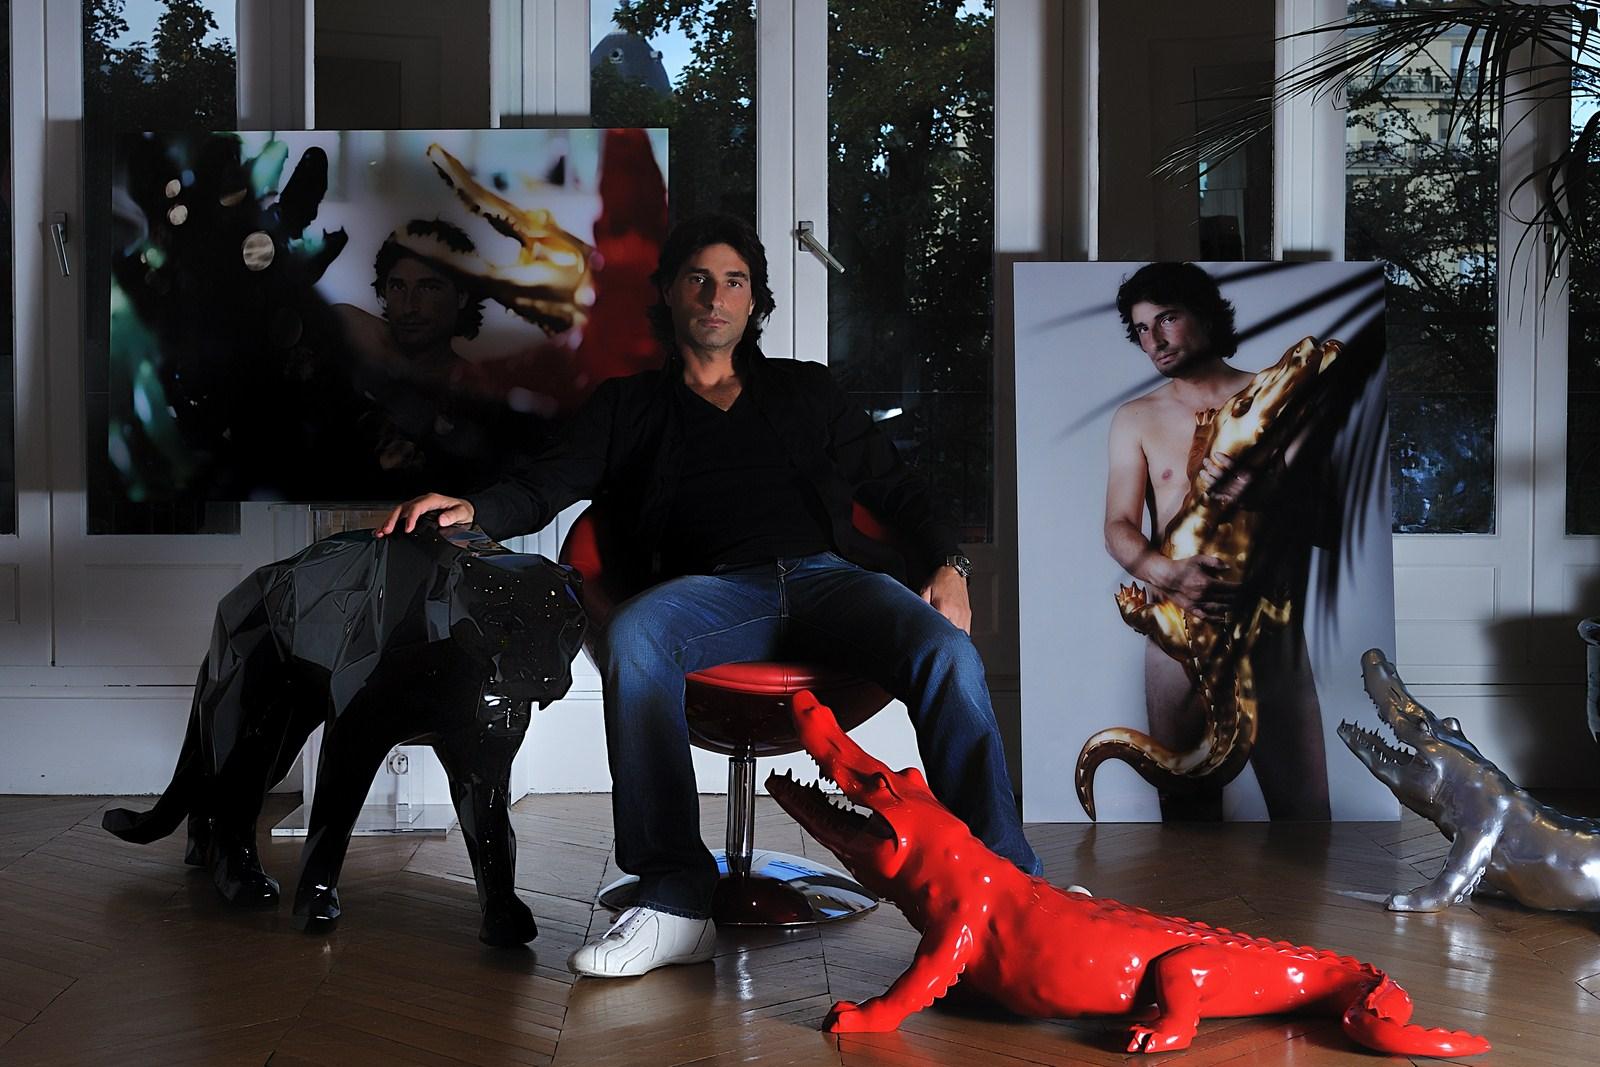 loveisspeed richard orlinski art. Black Bedroom Furniture Sets. Home Design Ideas